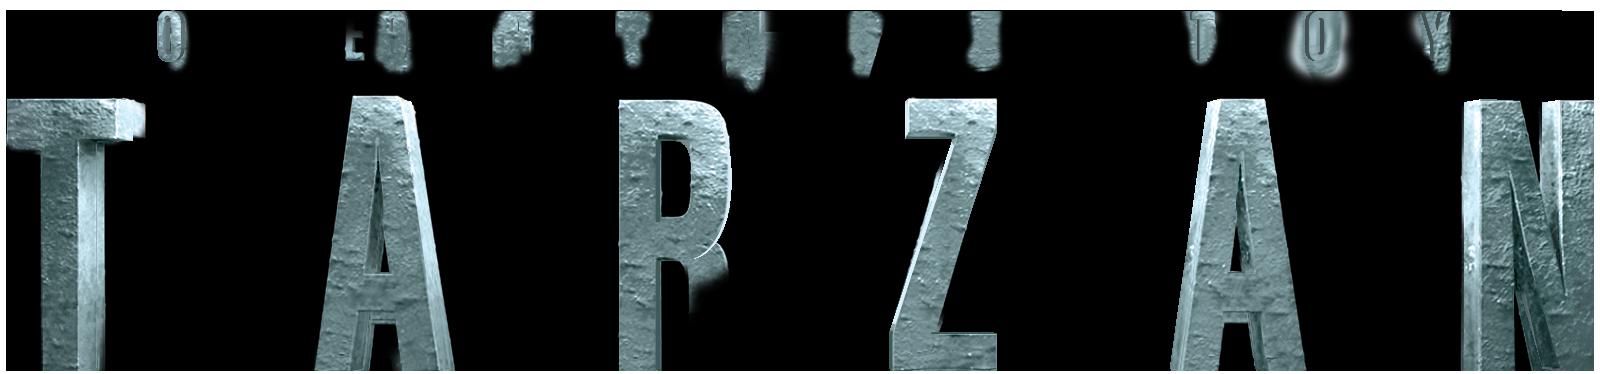 The Legend of Tarzan Greek title design for Netflix